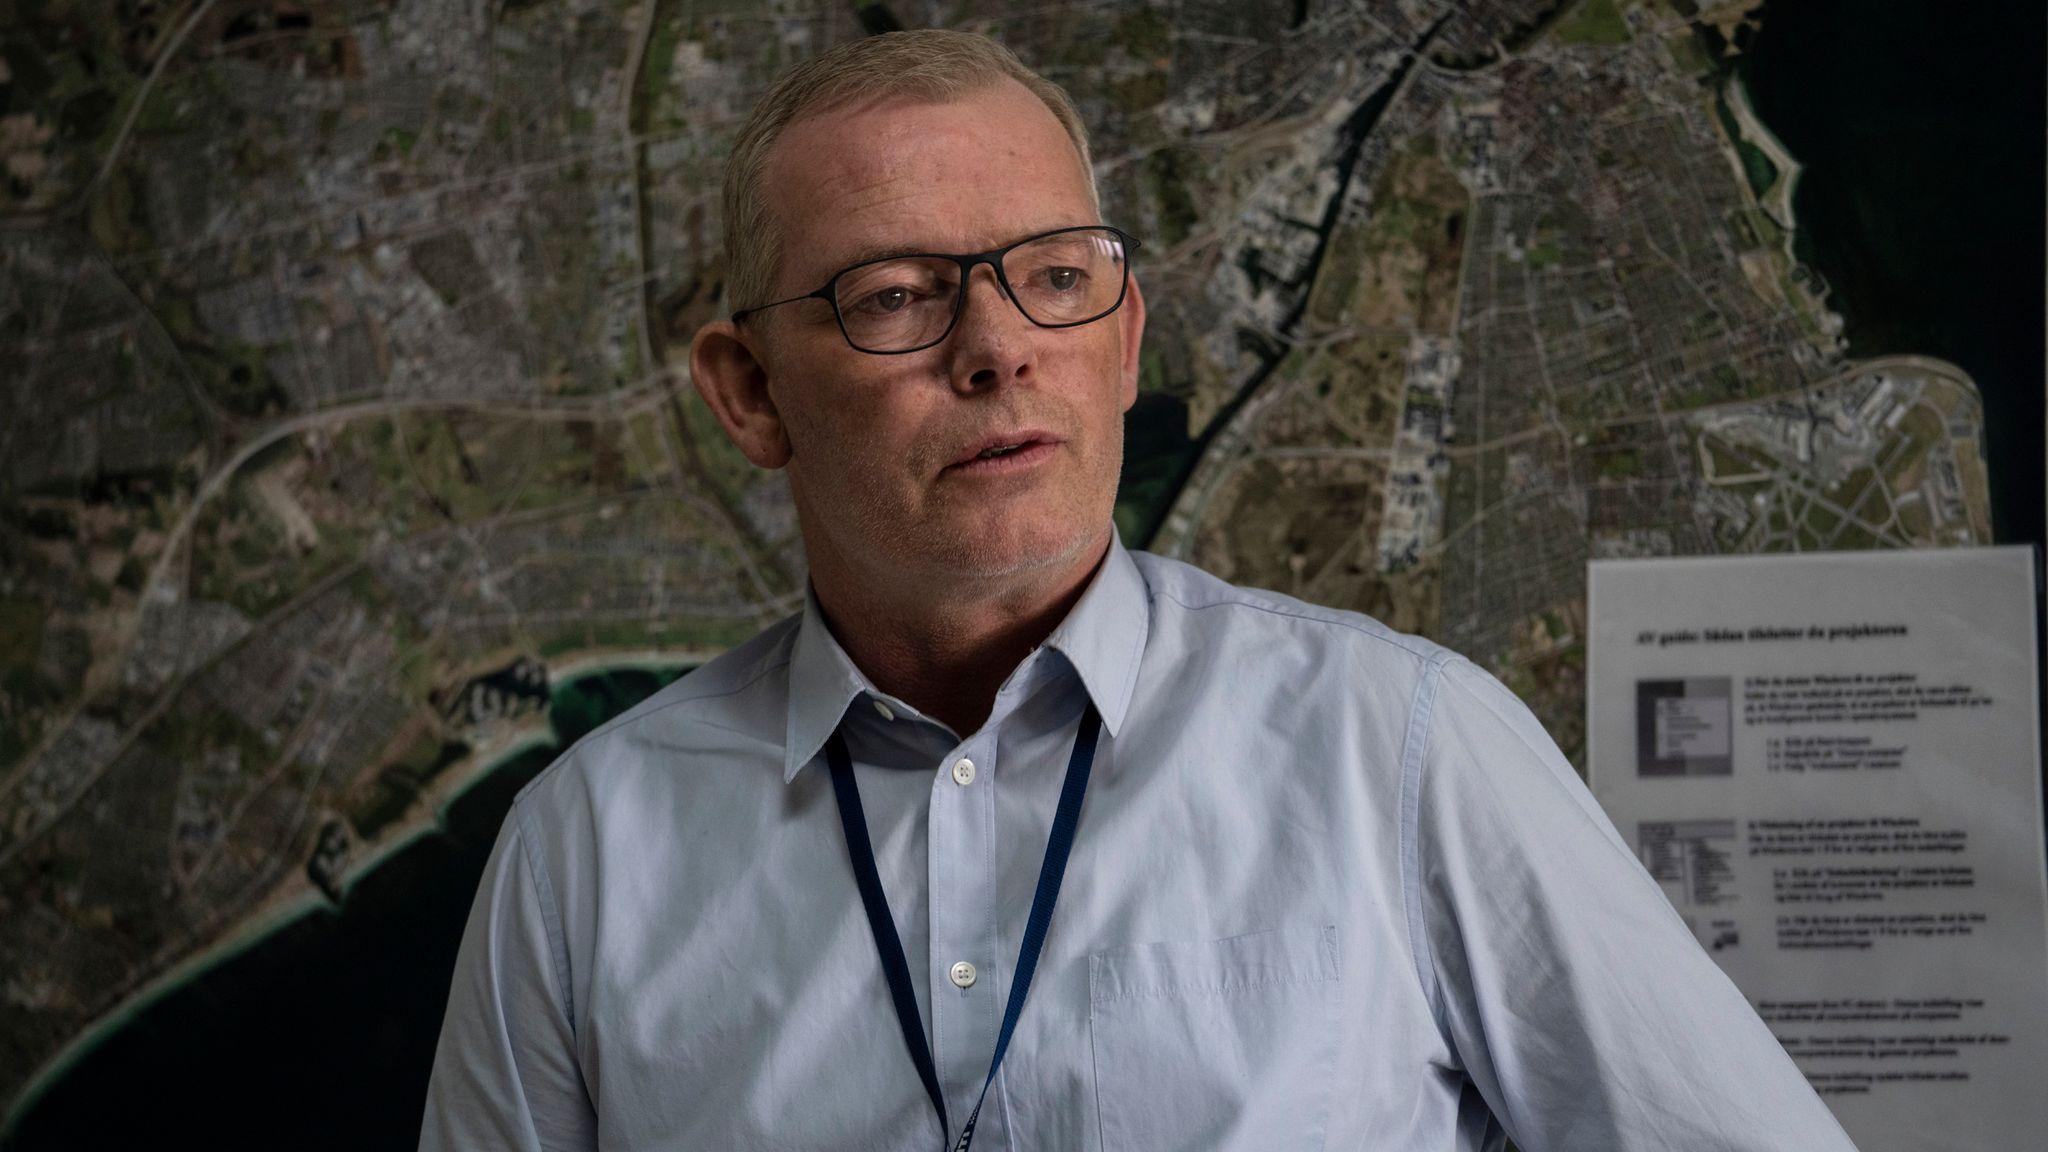 Jens Moller (SOREN MALLING) in The Investigation. Pic: BBC / misofilm & outline film / Per Arnesen